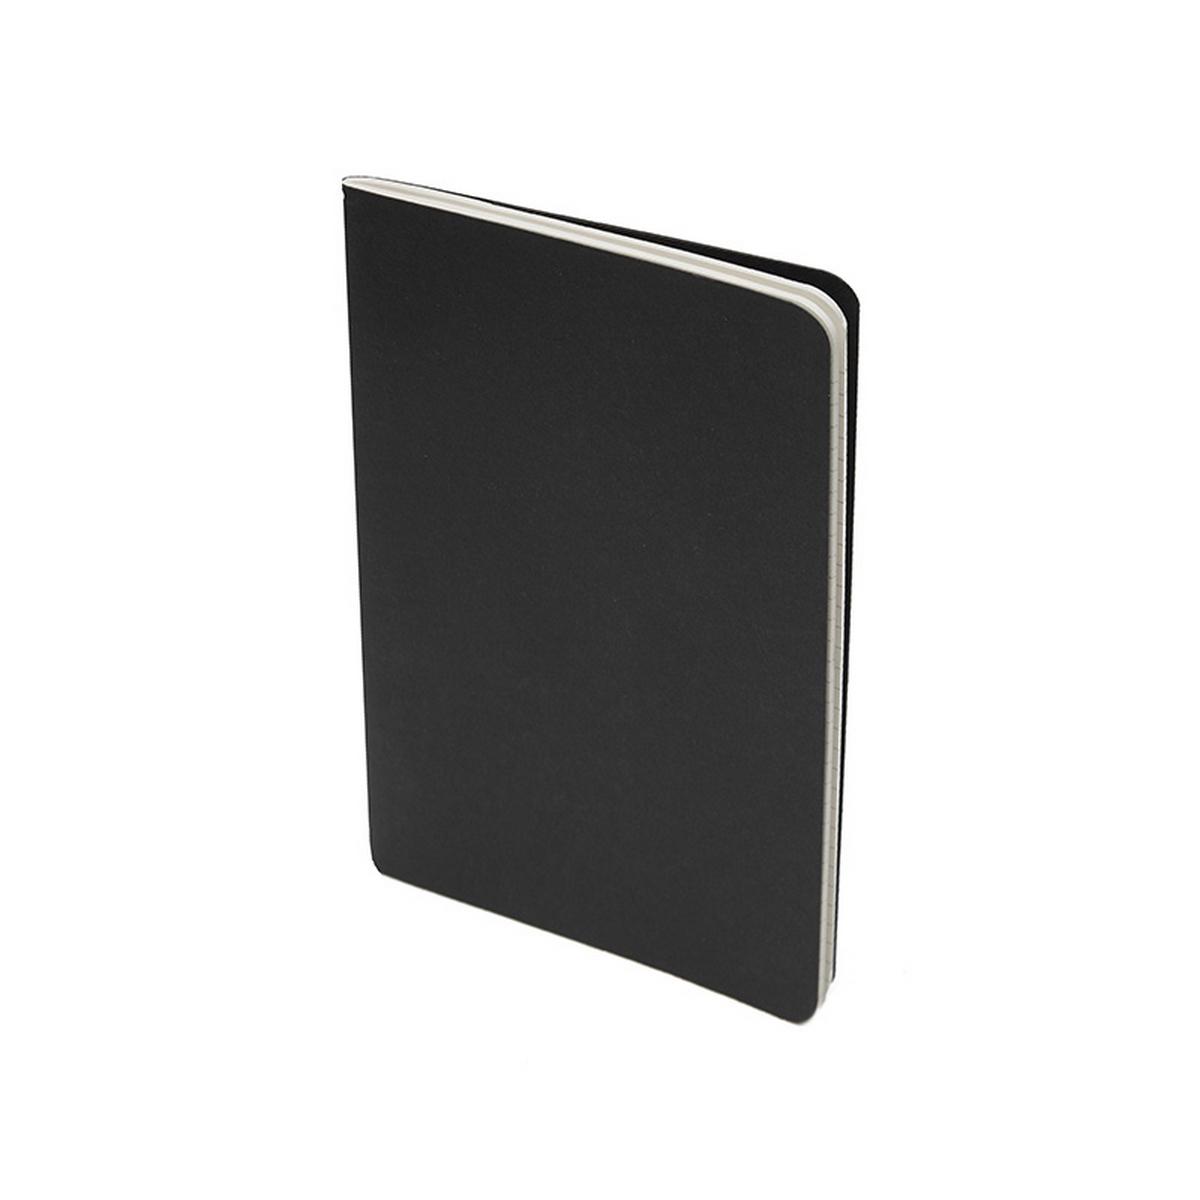 Moleskine Cuaderno Tapa Blanda 21x12,7